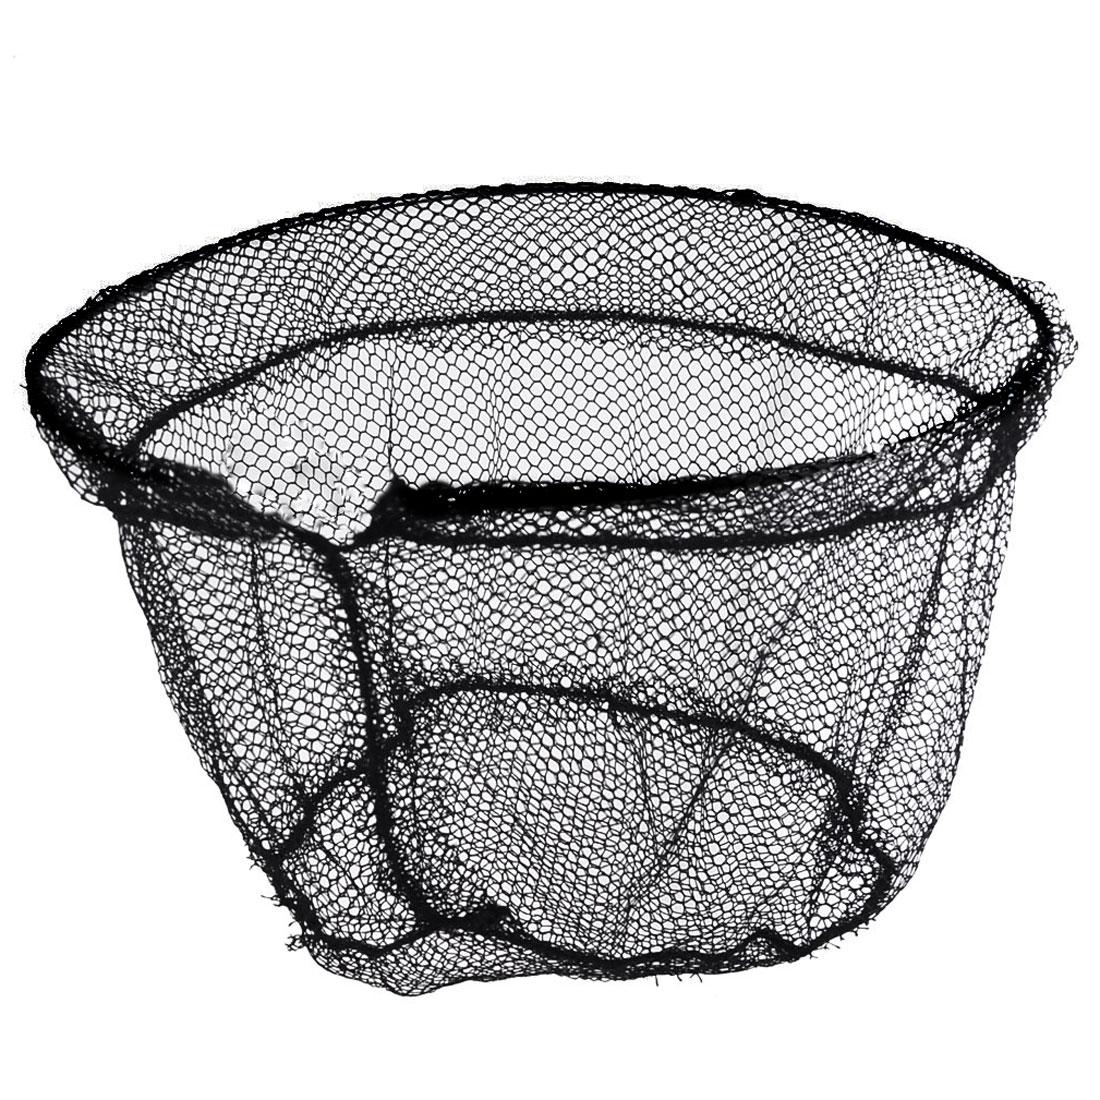 Foldable 50cm Mouth Dia Fish Crawfish Crab Fishing Landing Net Head